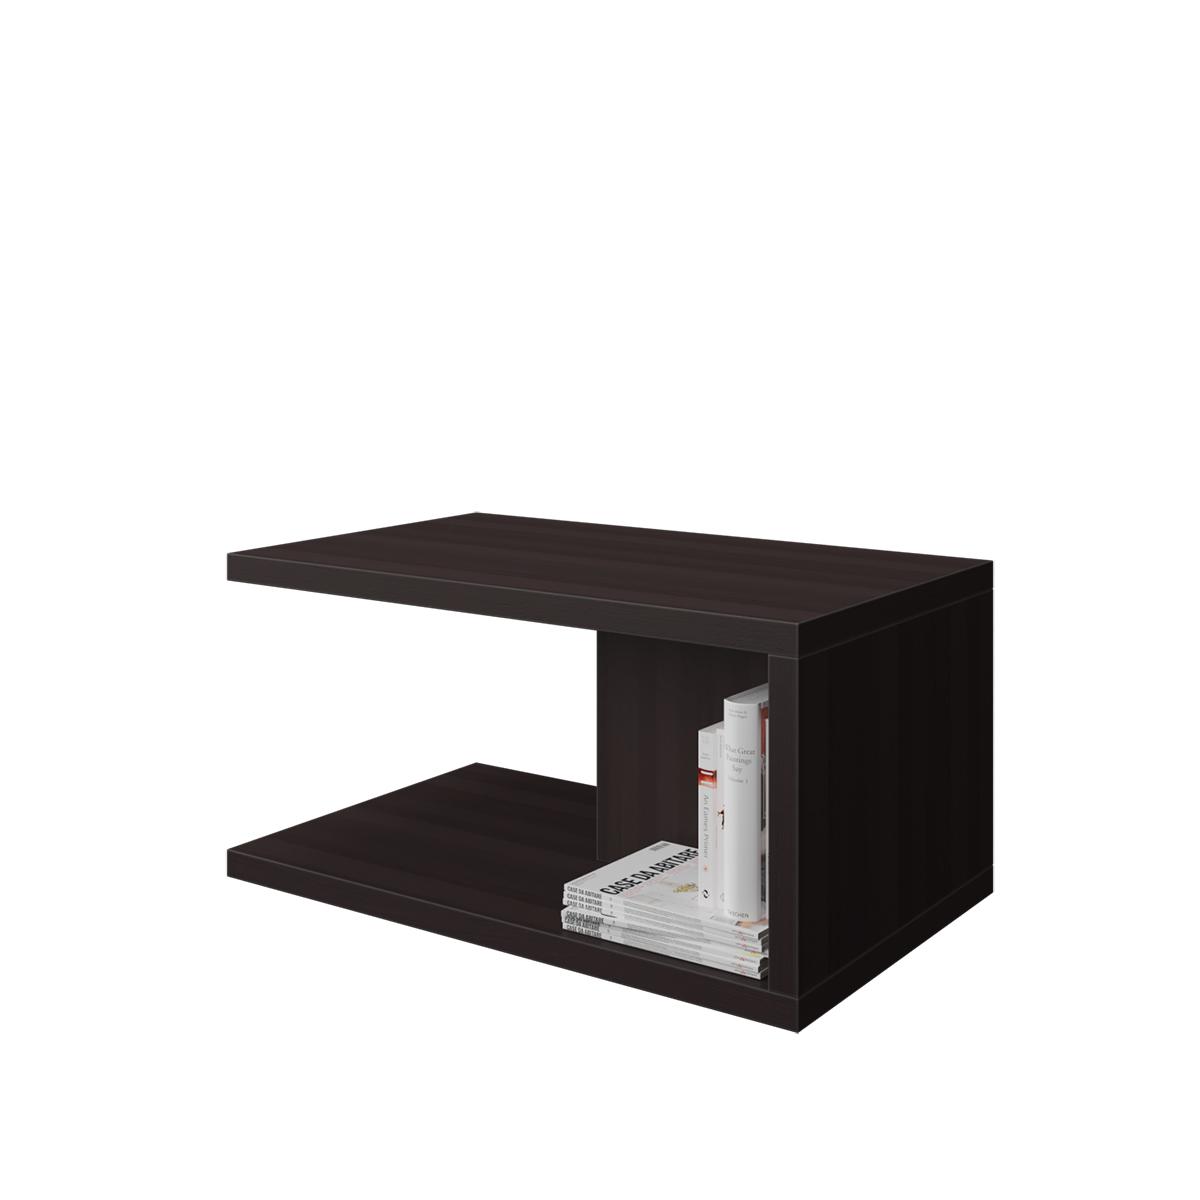 Стол QW Опра венге 90х45х55 см фото